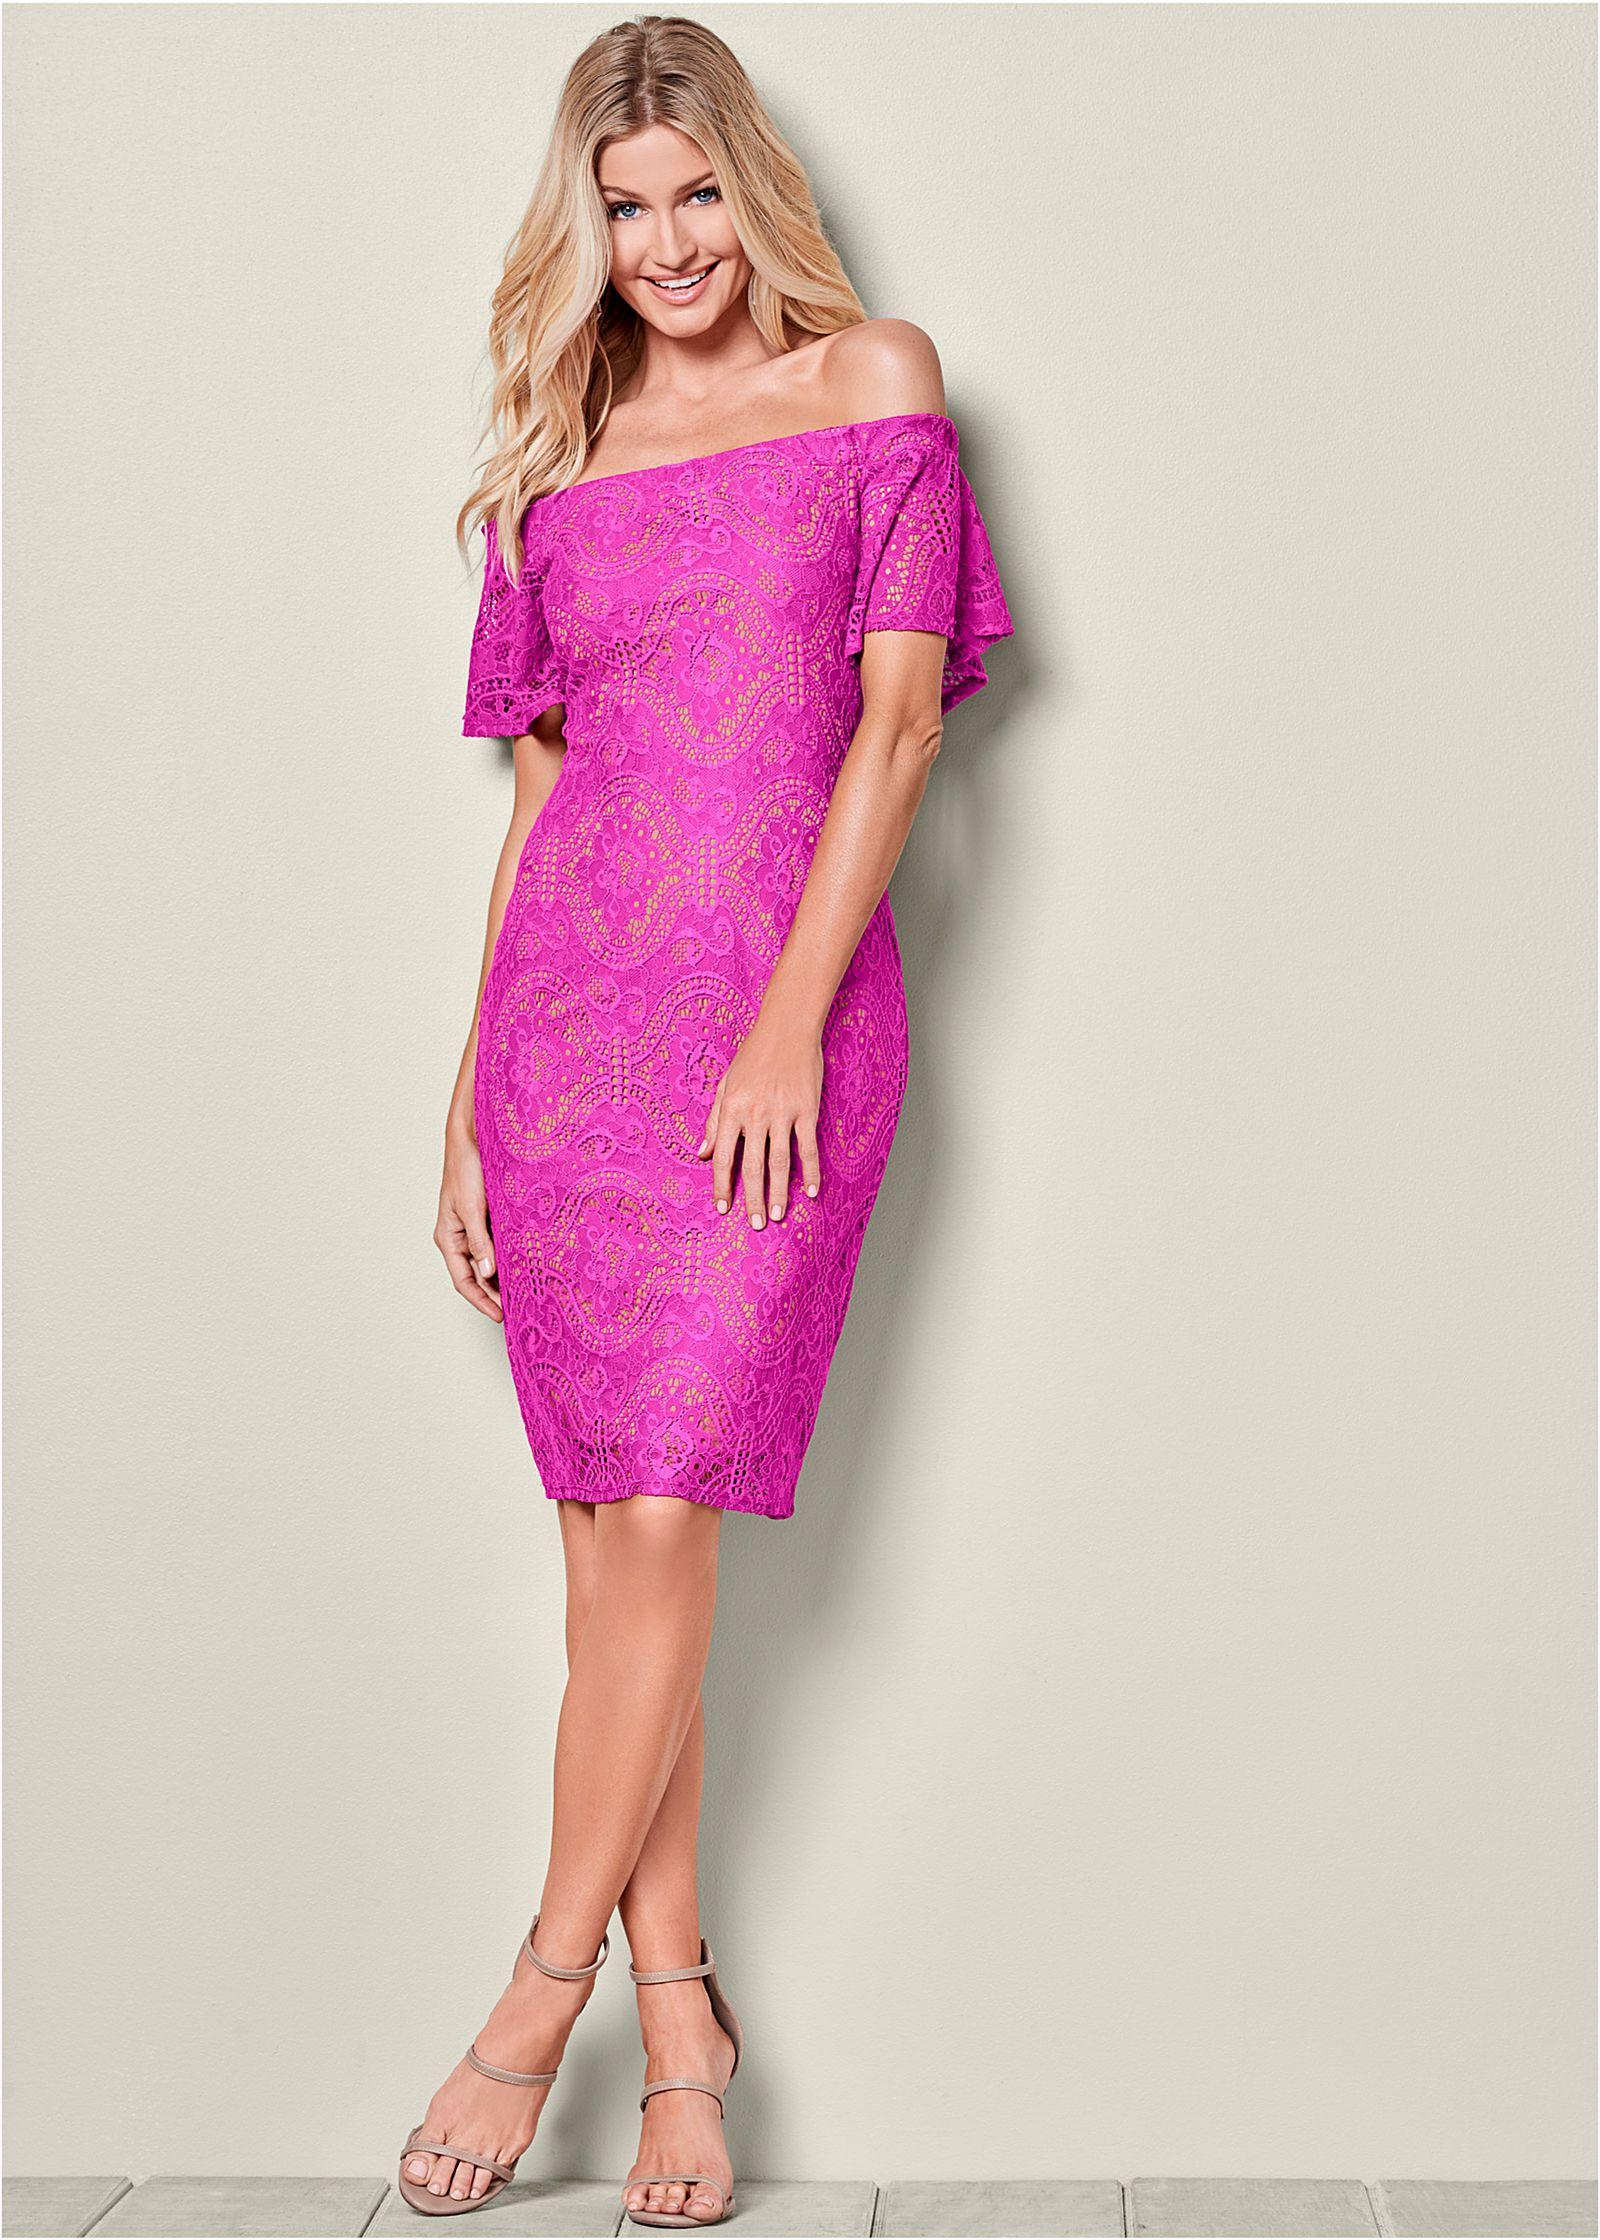 Fuschia Cocktail Dress